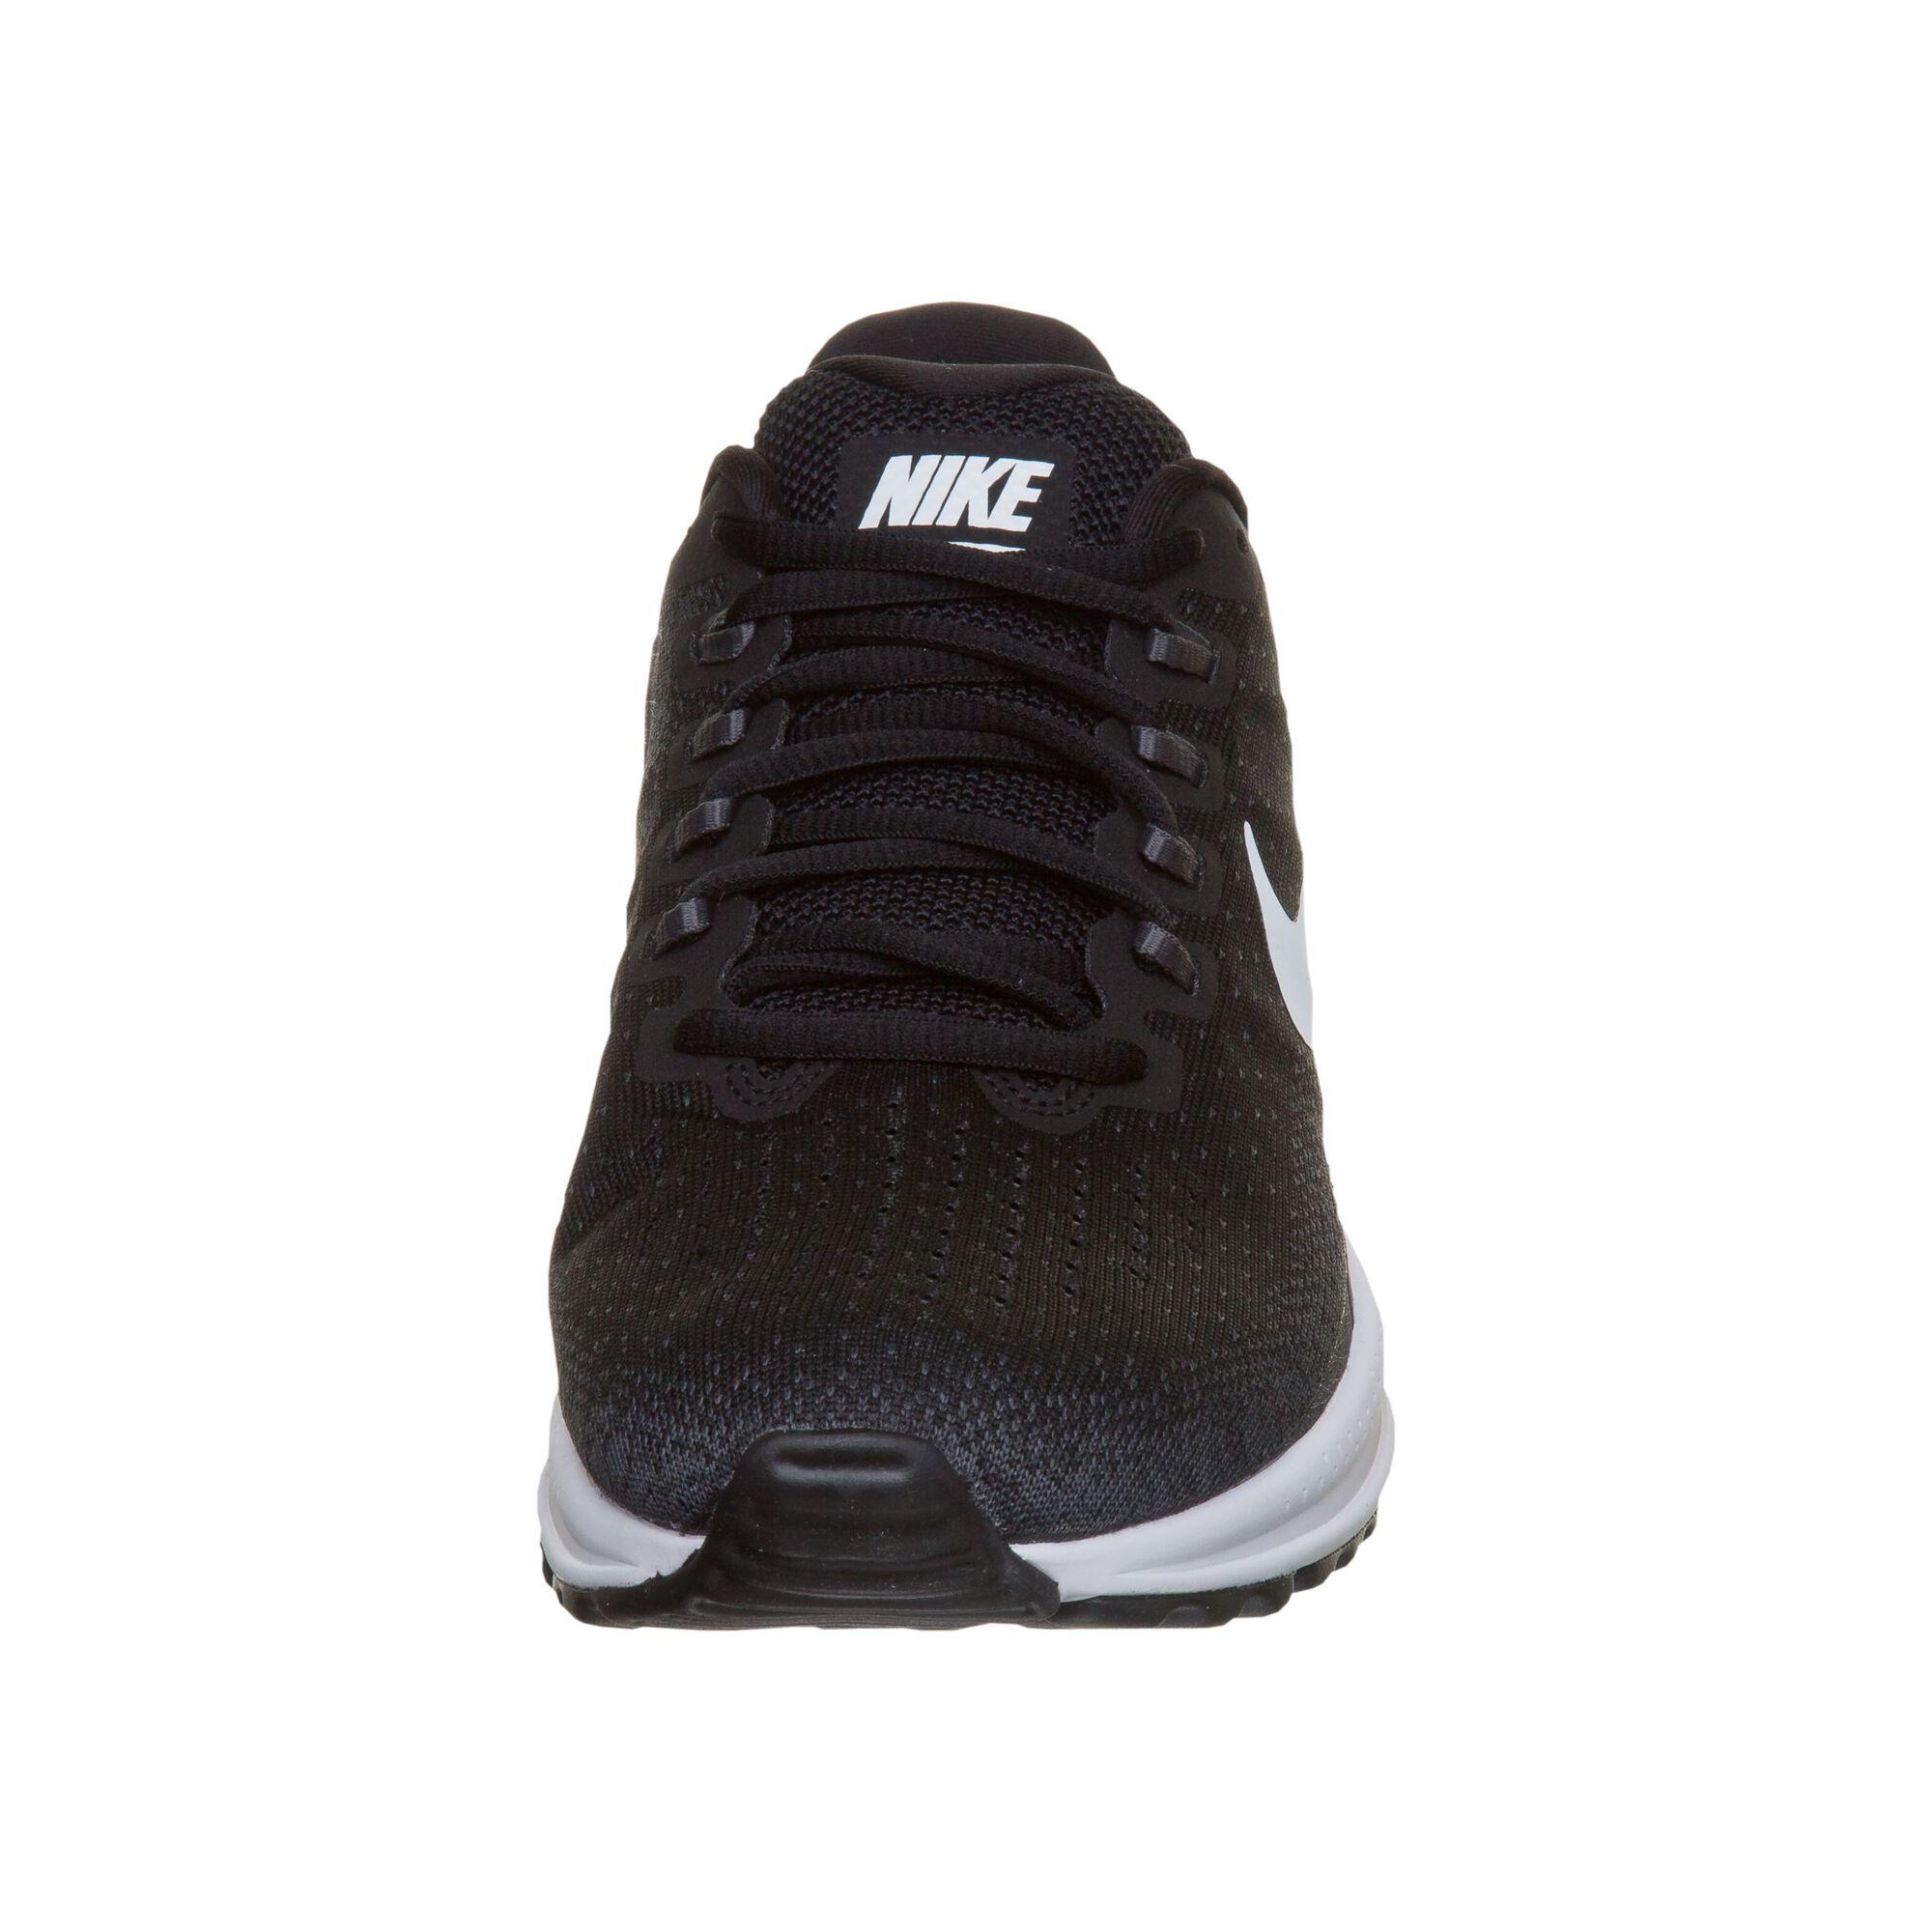 competitive price e09c0 ea9e1 ... Nike  Nike  Nike  Nike. Air Zoom Vomero 13 ...